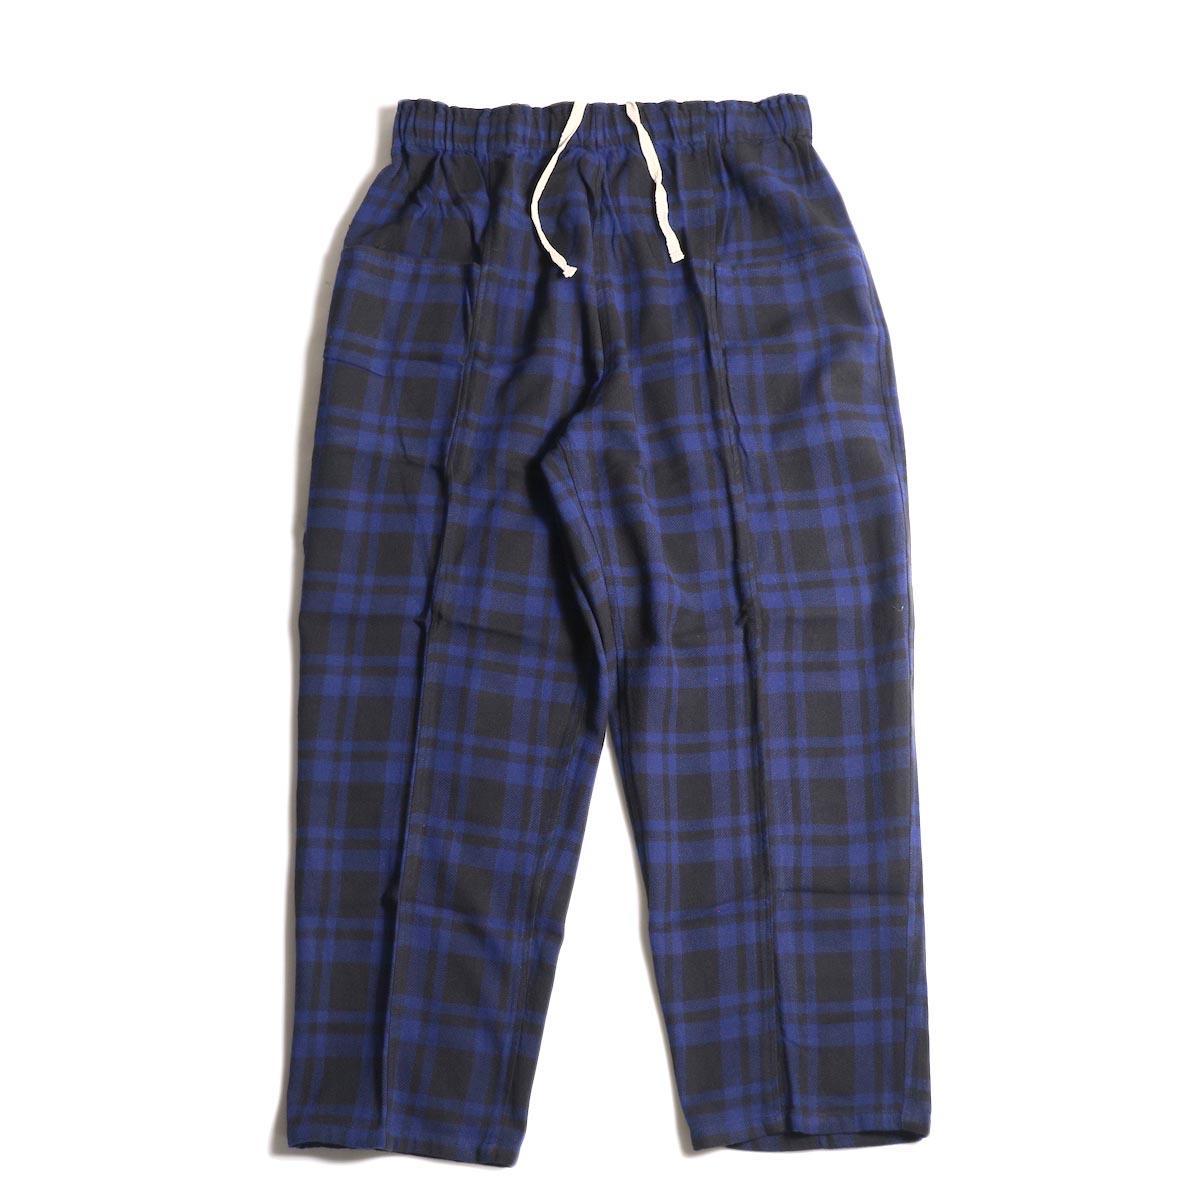 SOUTH2 WEST8 / Army String Pant -Plaid Twill (Blue/Black)